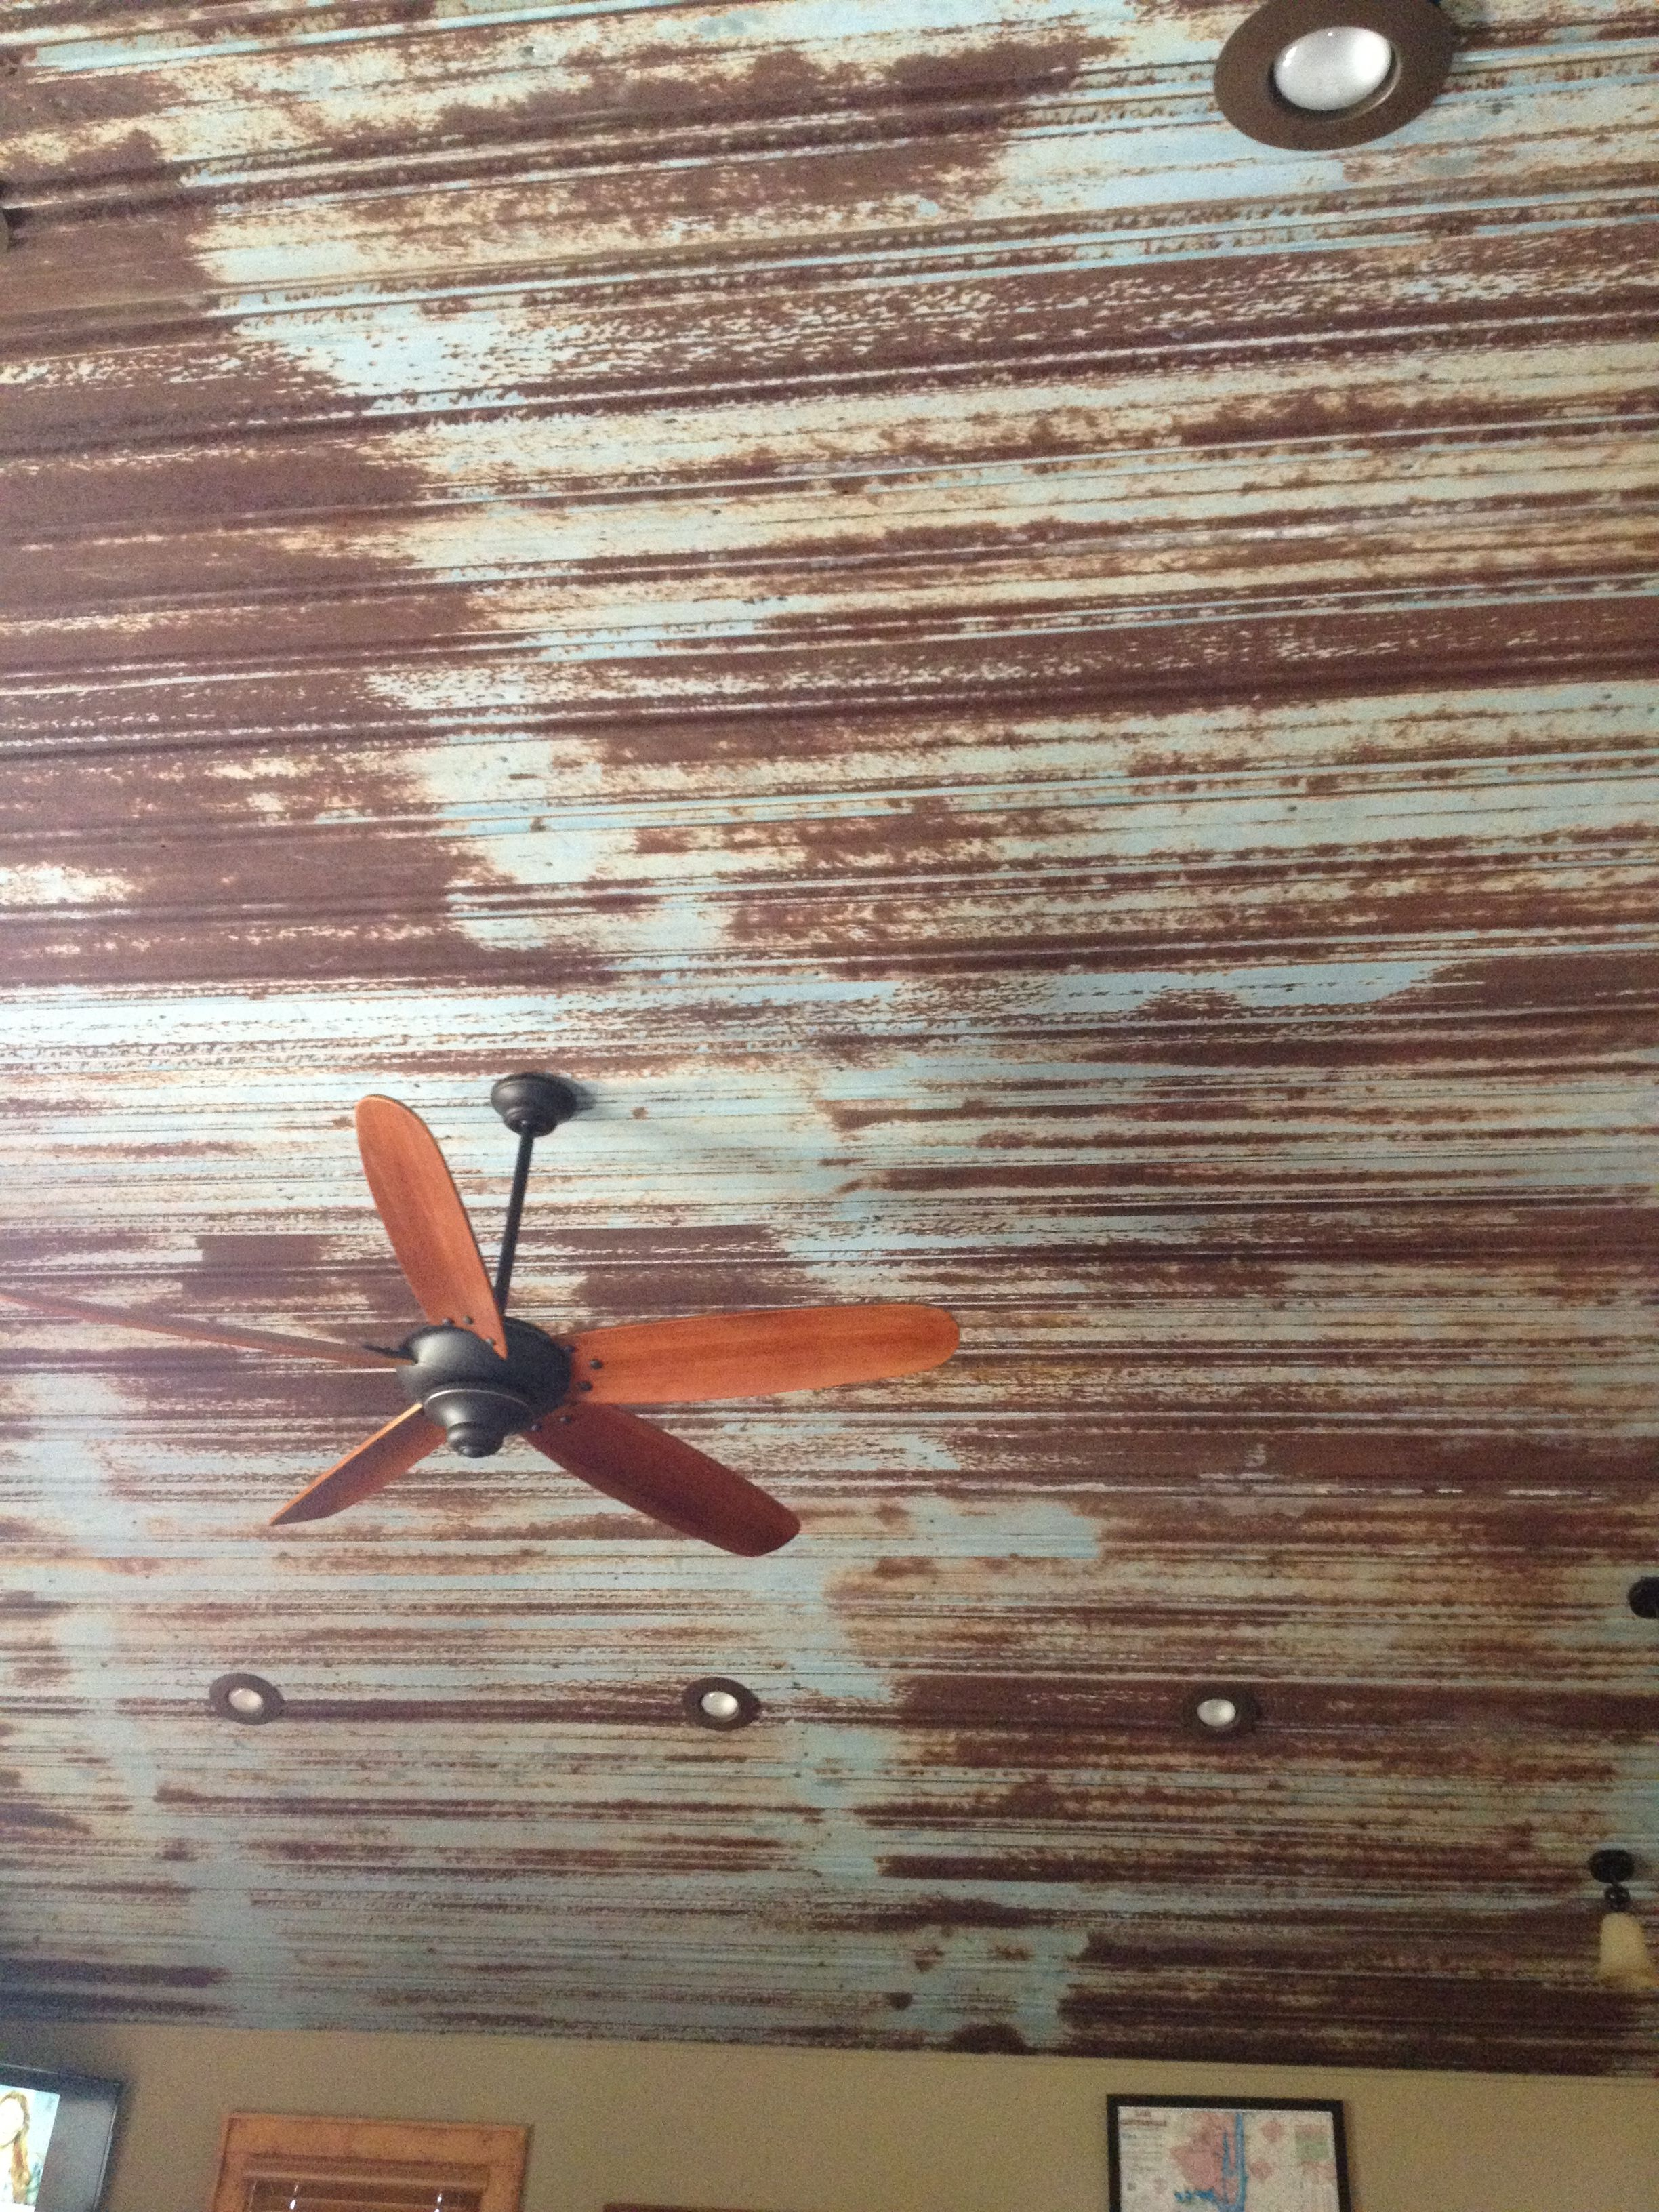 Rustic Metal Roof For Basement Metal Roof Panels Rustic Basement Metal Roof